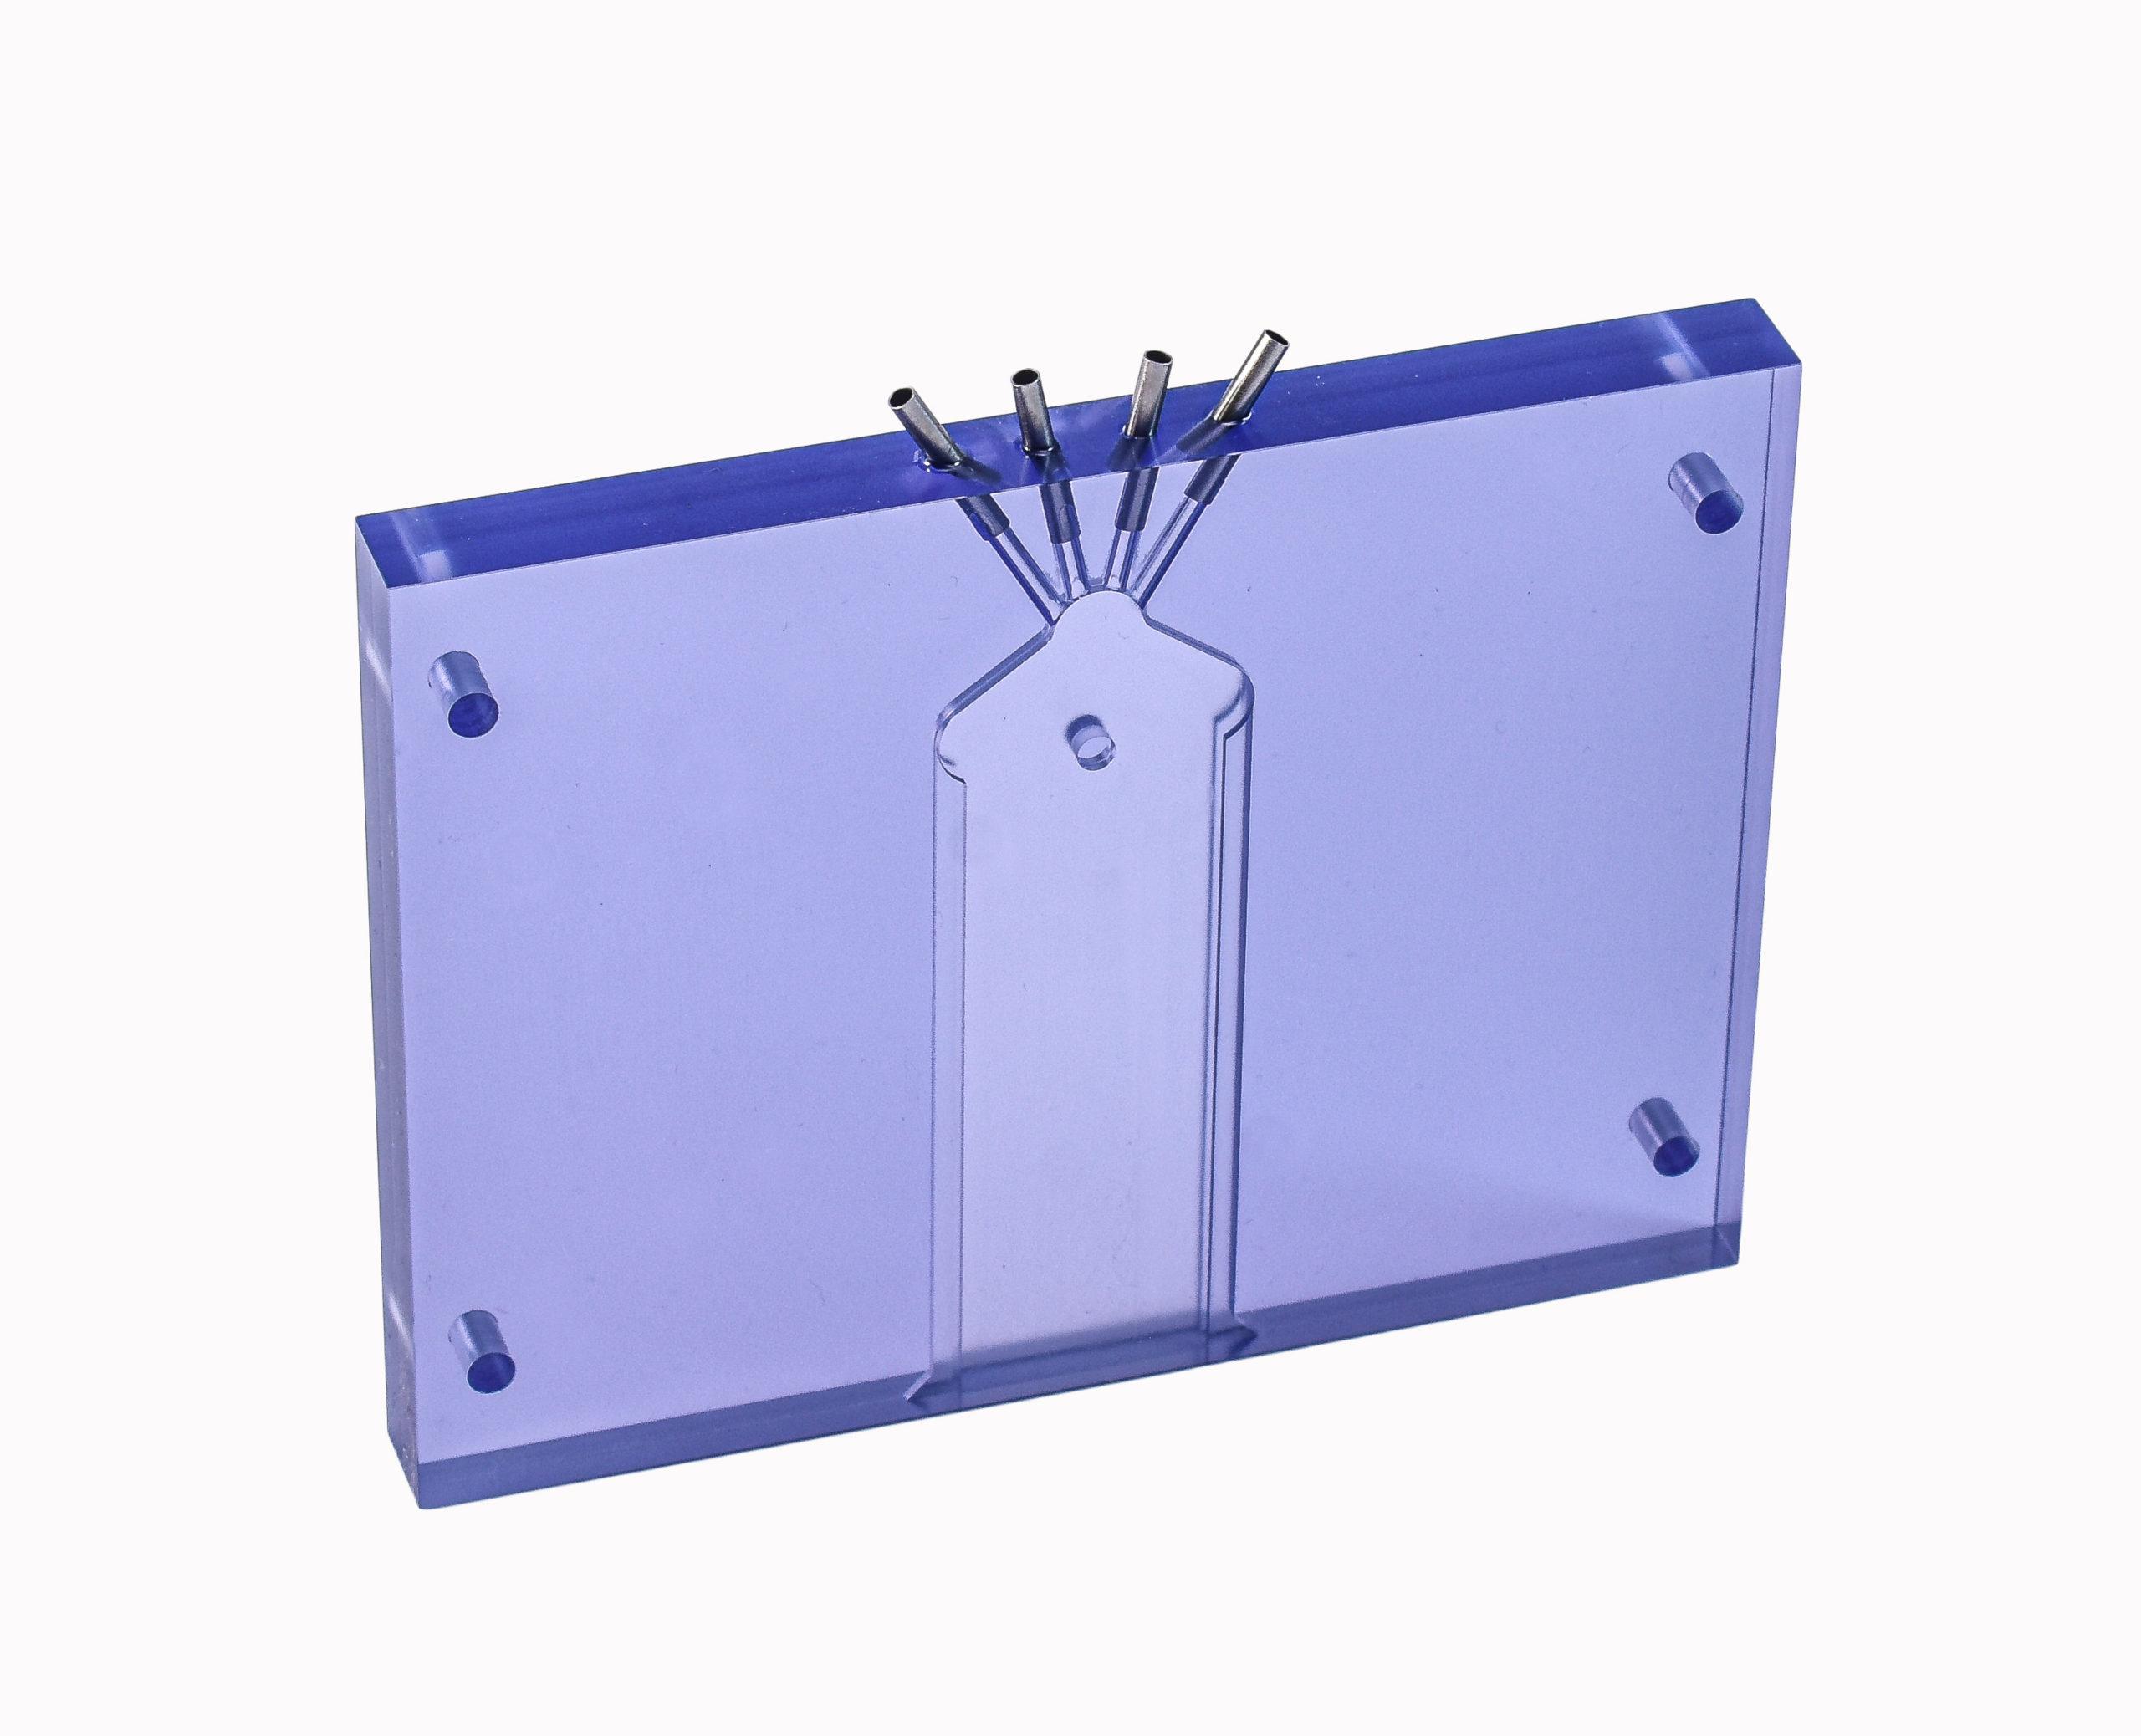 Photo of bonded PVC manifold